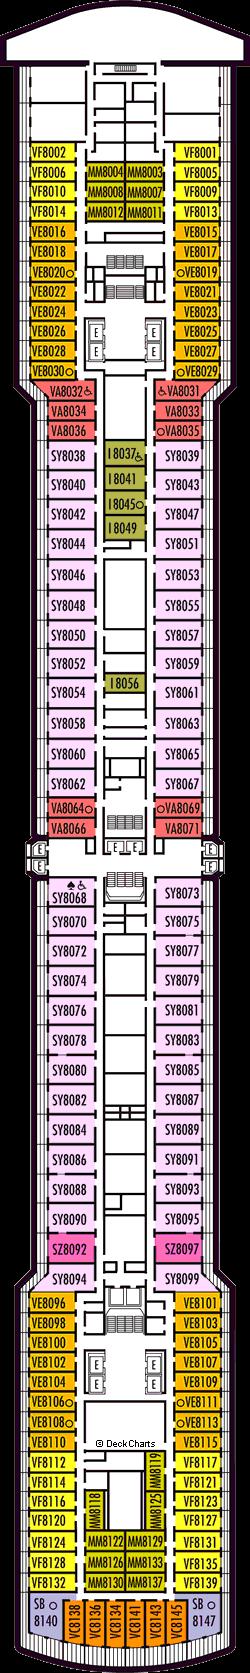 Oosterdam: Navigation Deck